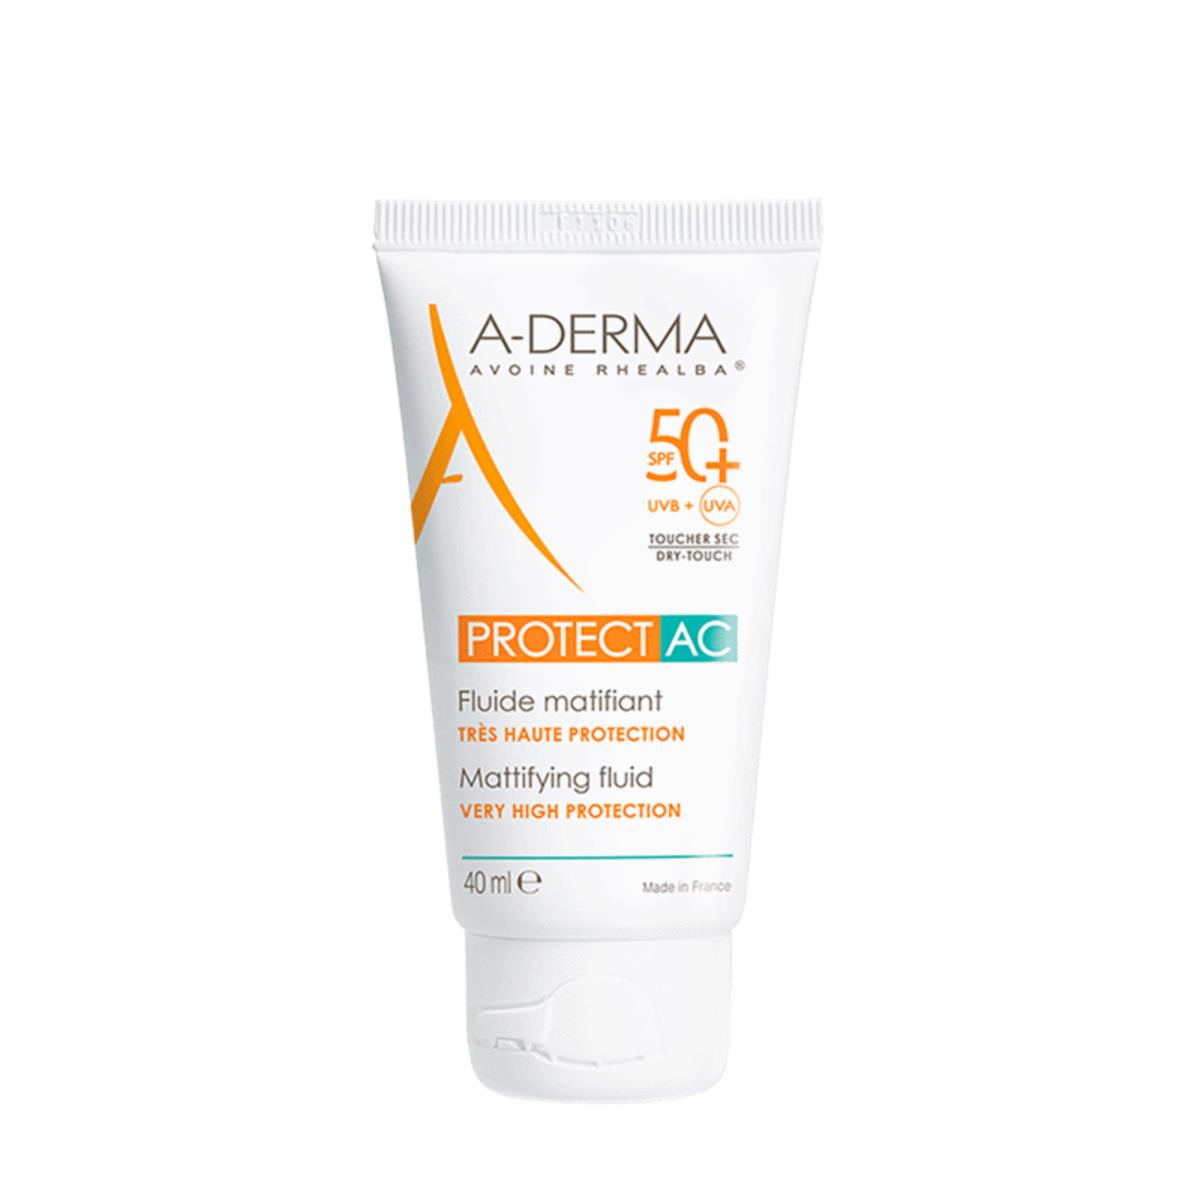 A-Derma Protect Ac Fps 50+ 40Ml